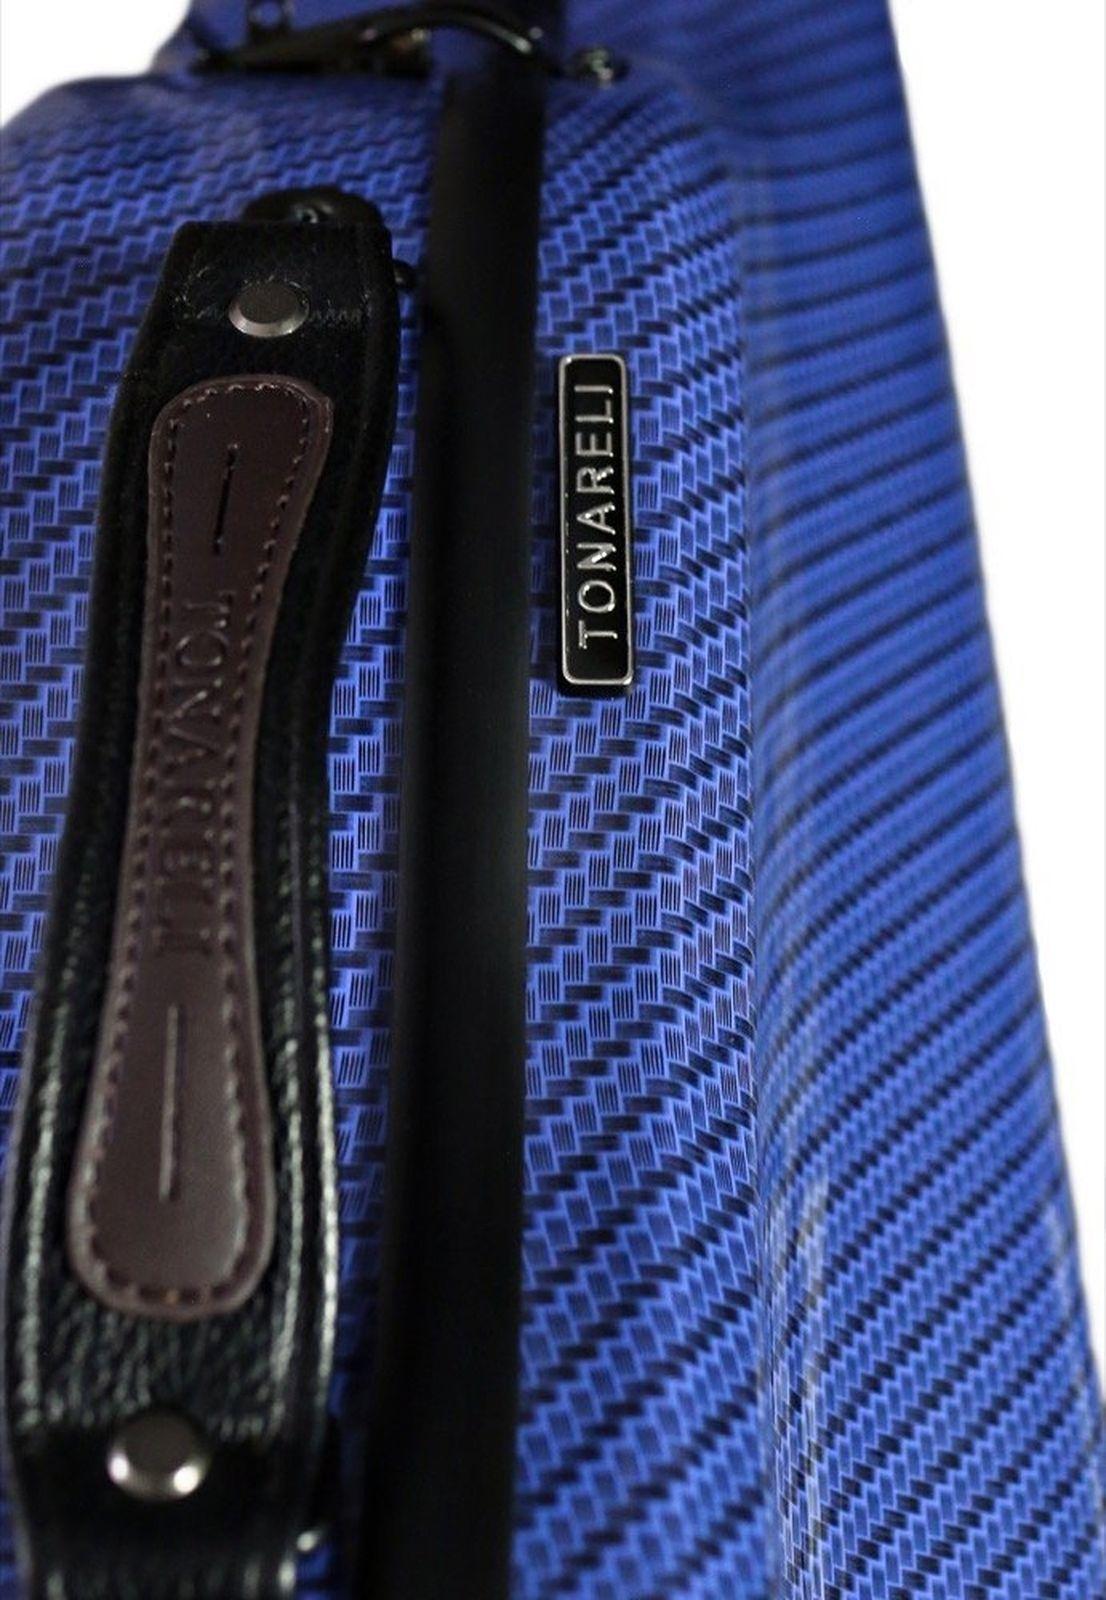 Tonareli Cello-shaped Fiberglass Viola Case w/Wheels - Special Edition Blue C...